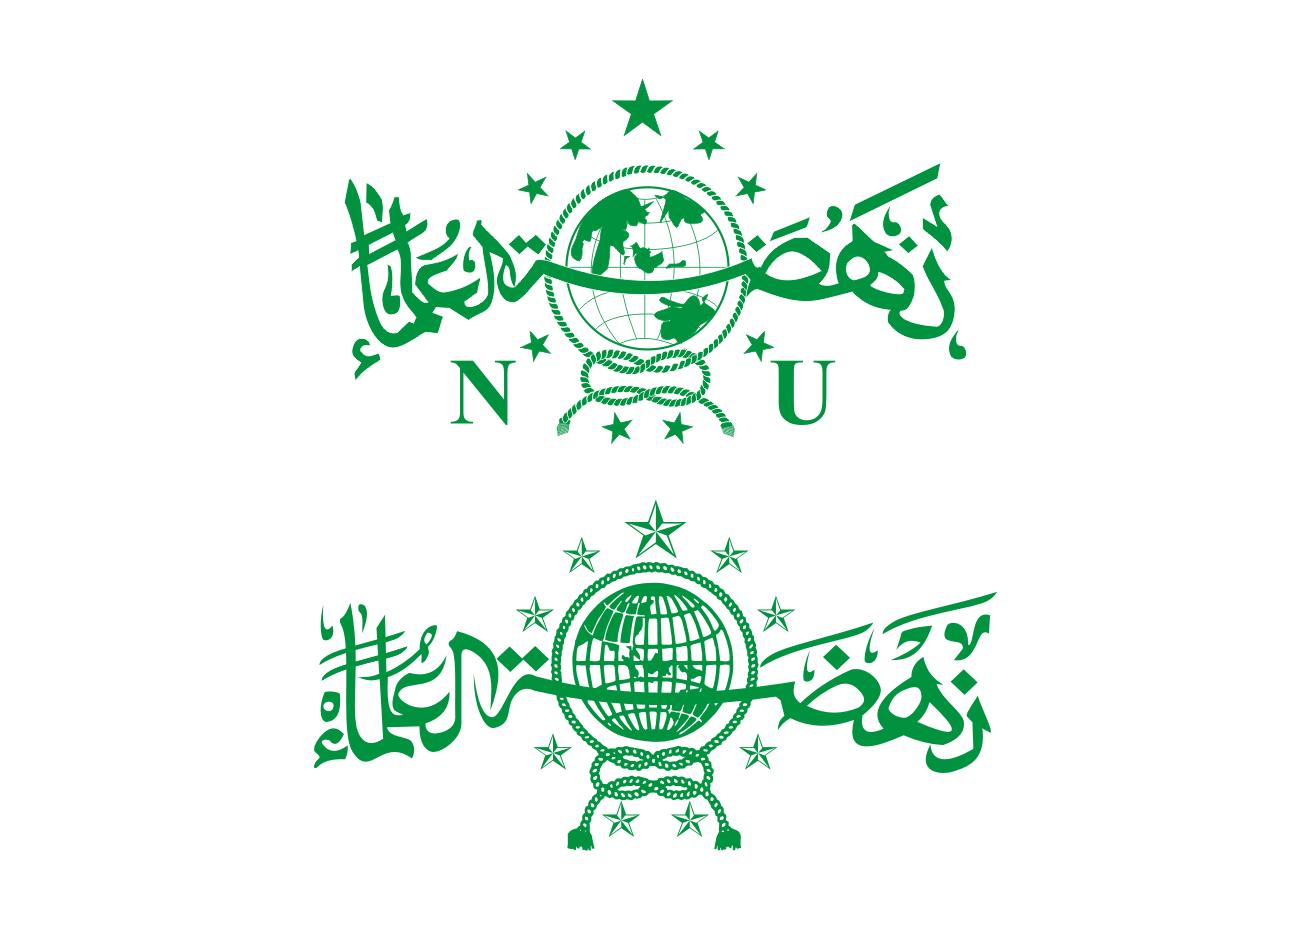 930+ Ide Desain Logo Nahdlatul Ulama HD Unduh Gratis